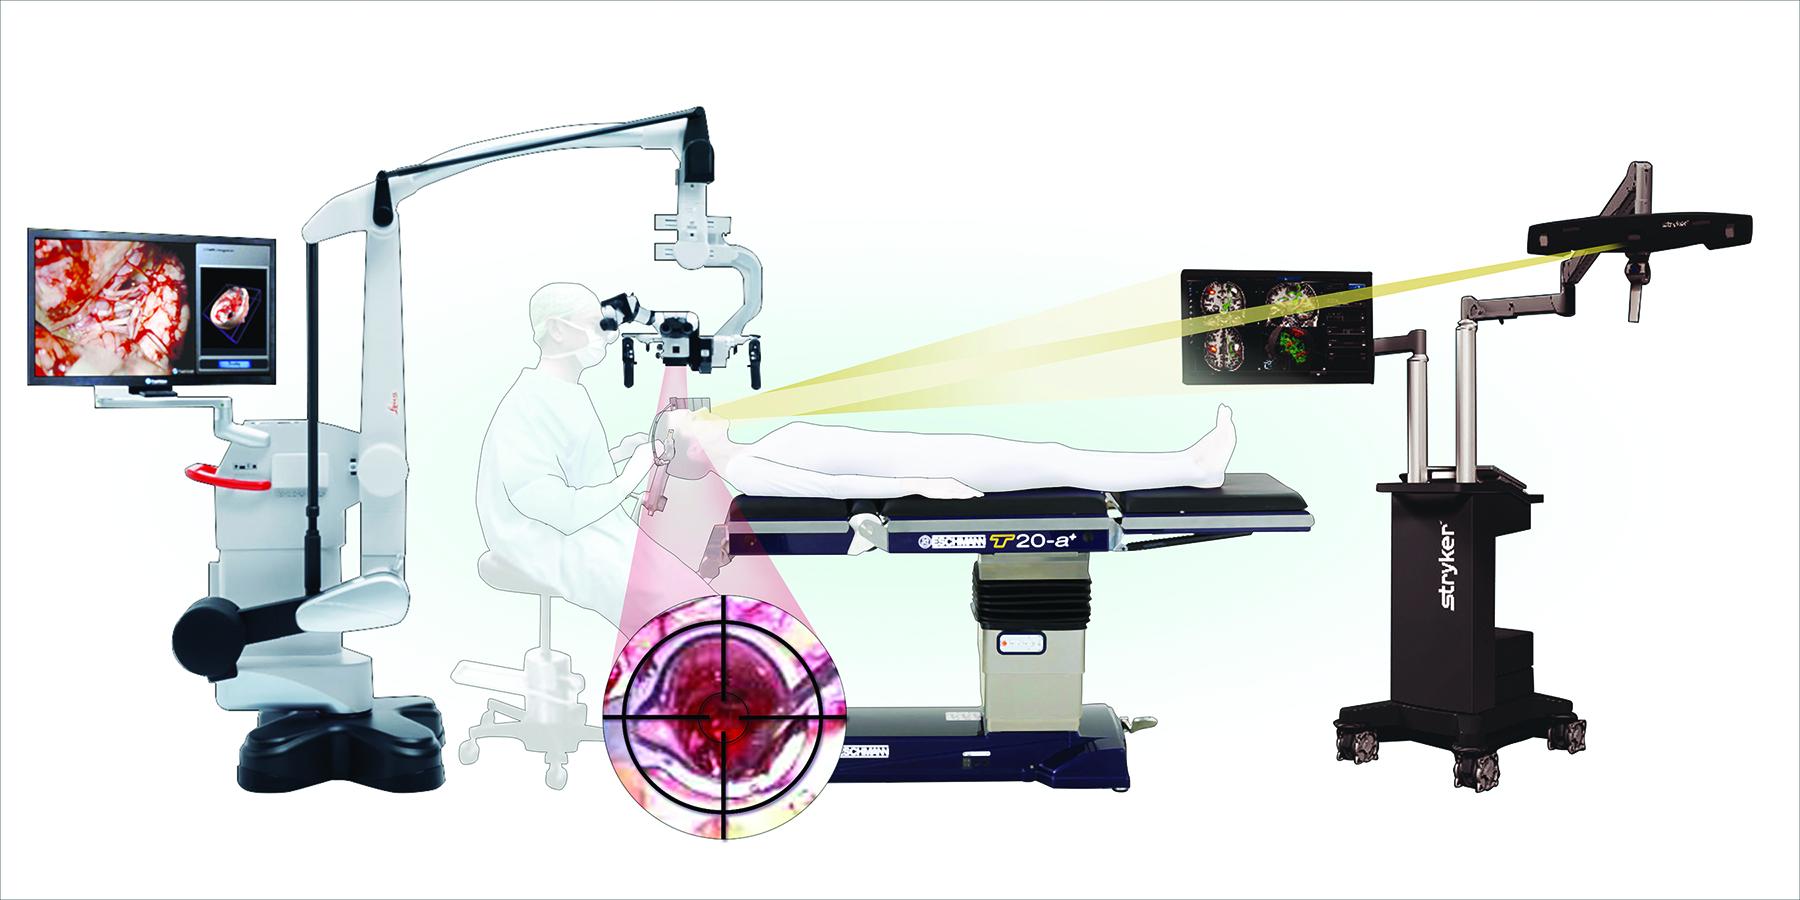 Cureus | Frameless Stereotactic Insertion of Viewsite Brain